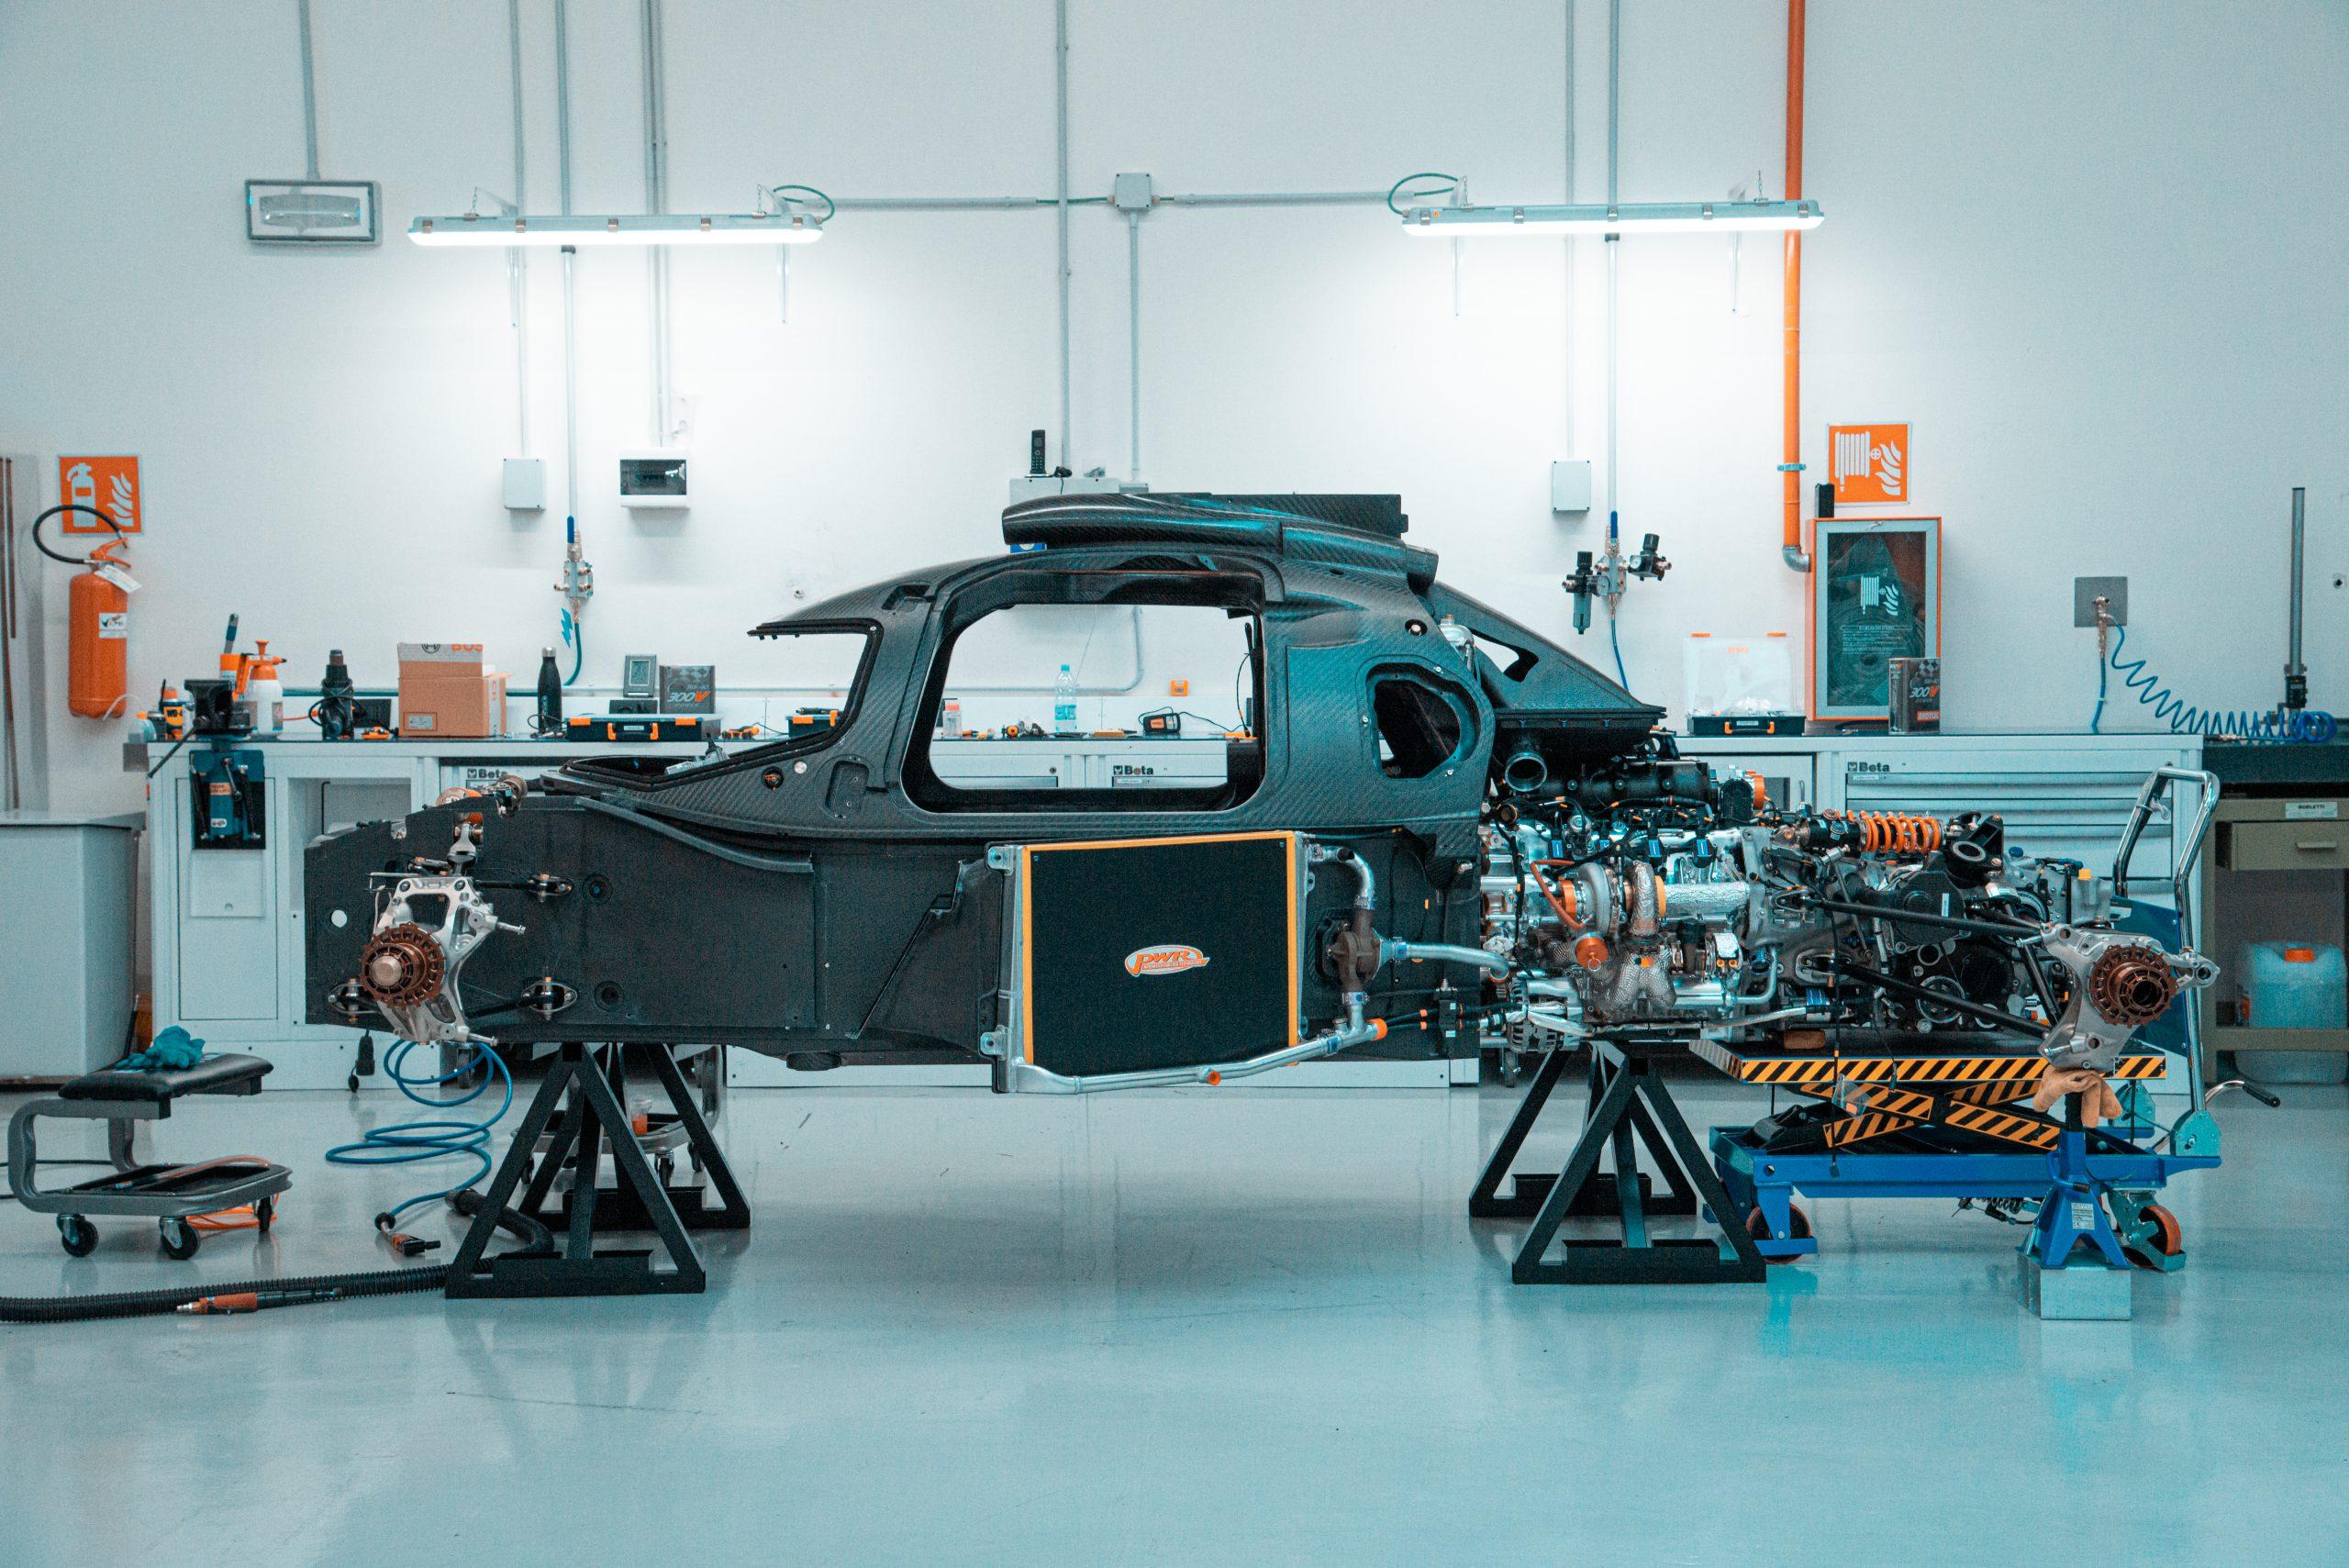 Glickenhaus 007 Hypercar LMH profile chassis engine monocoque